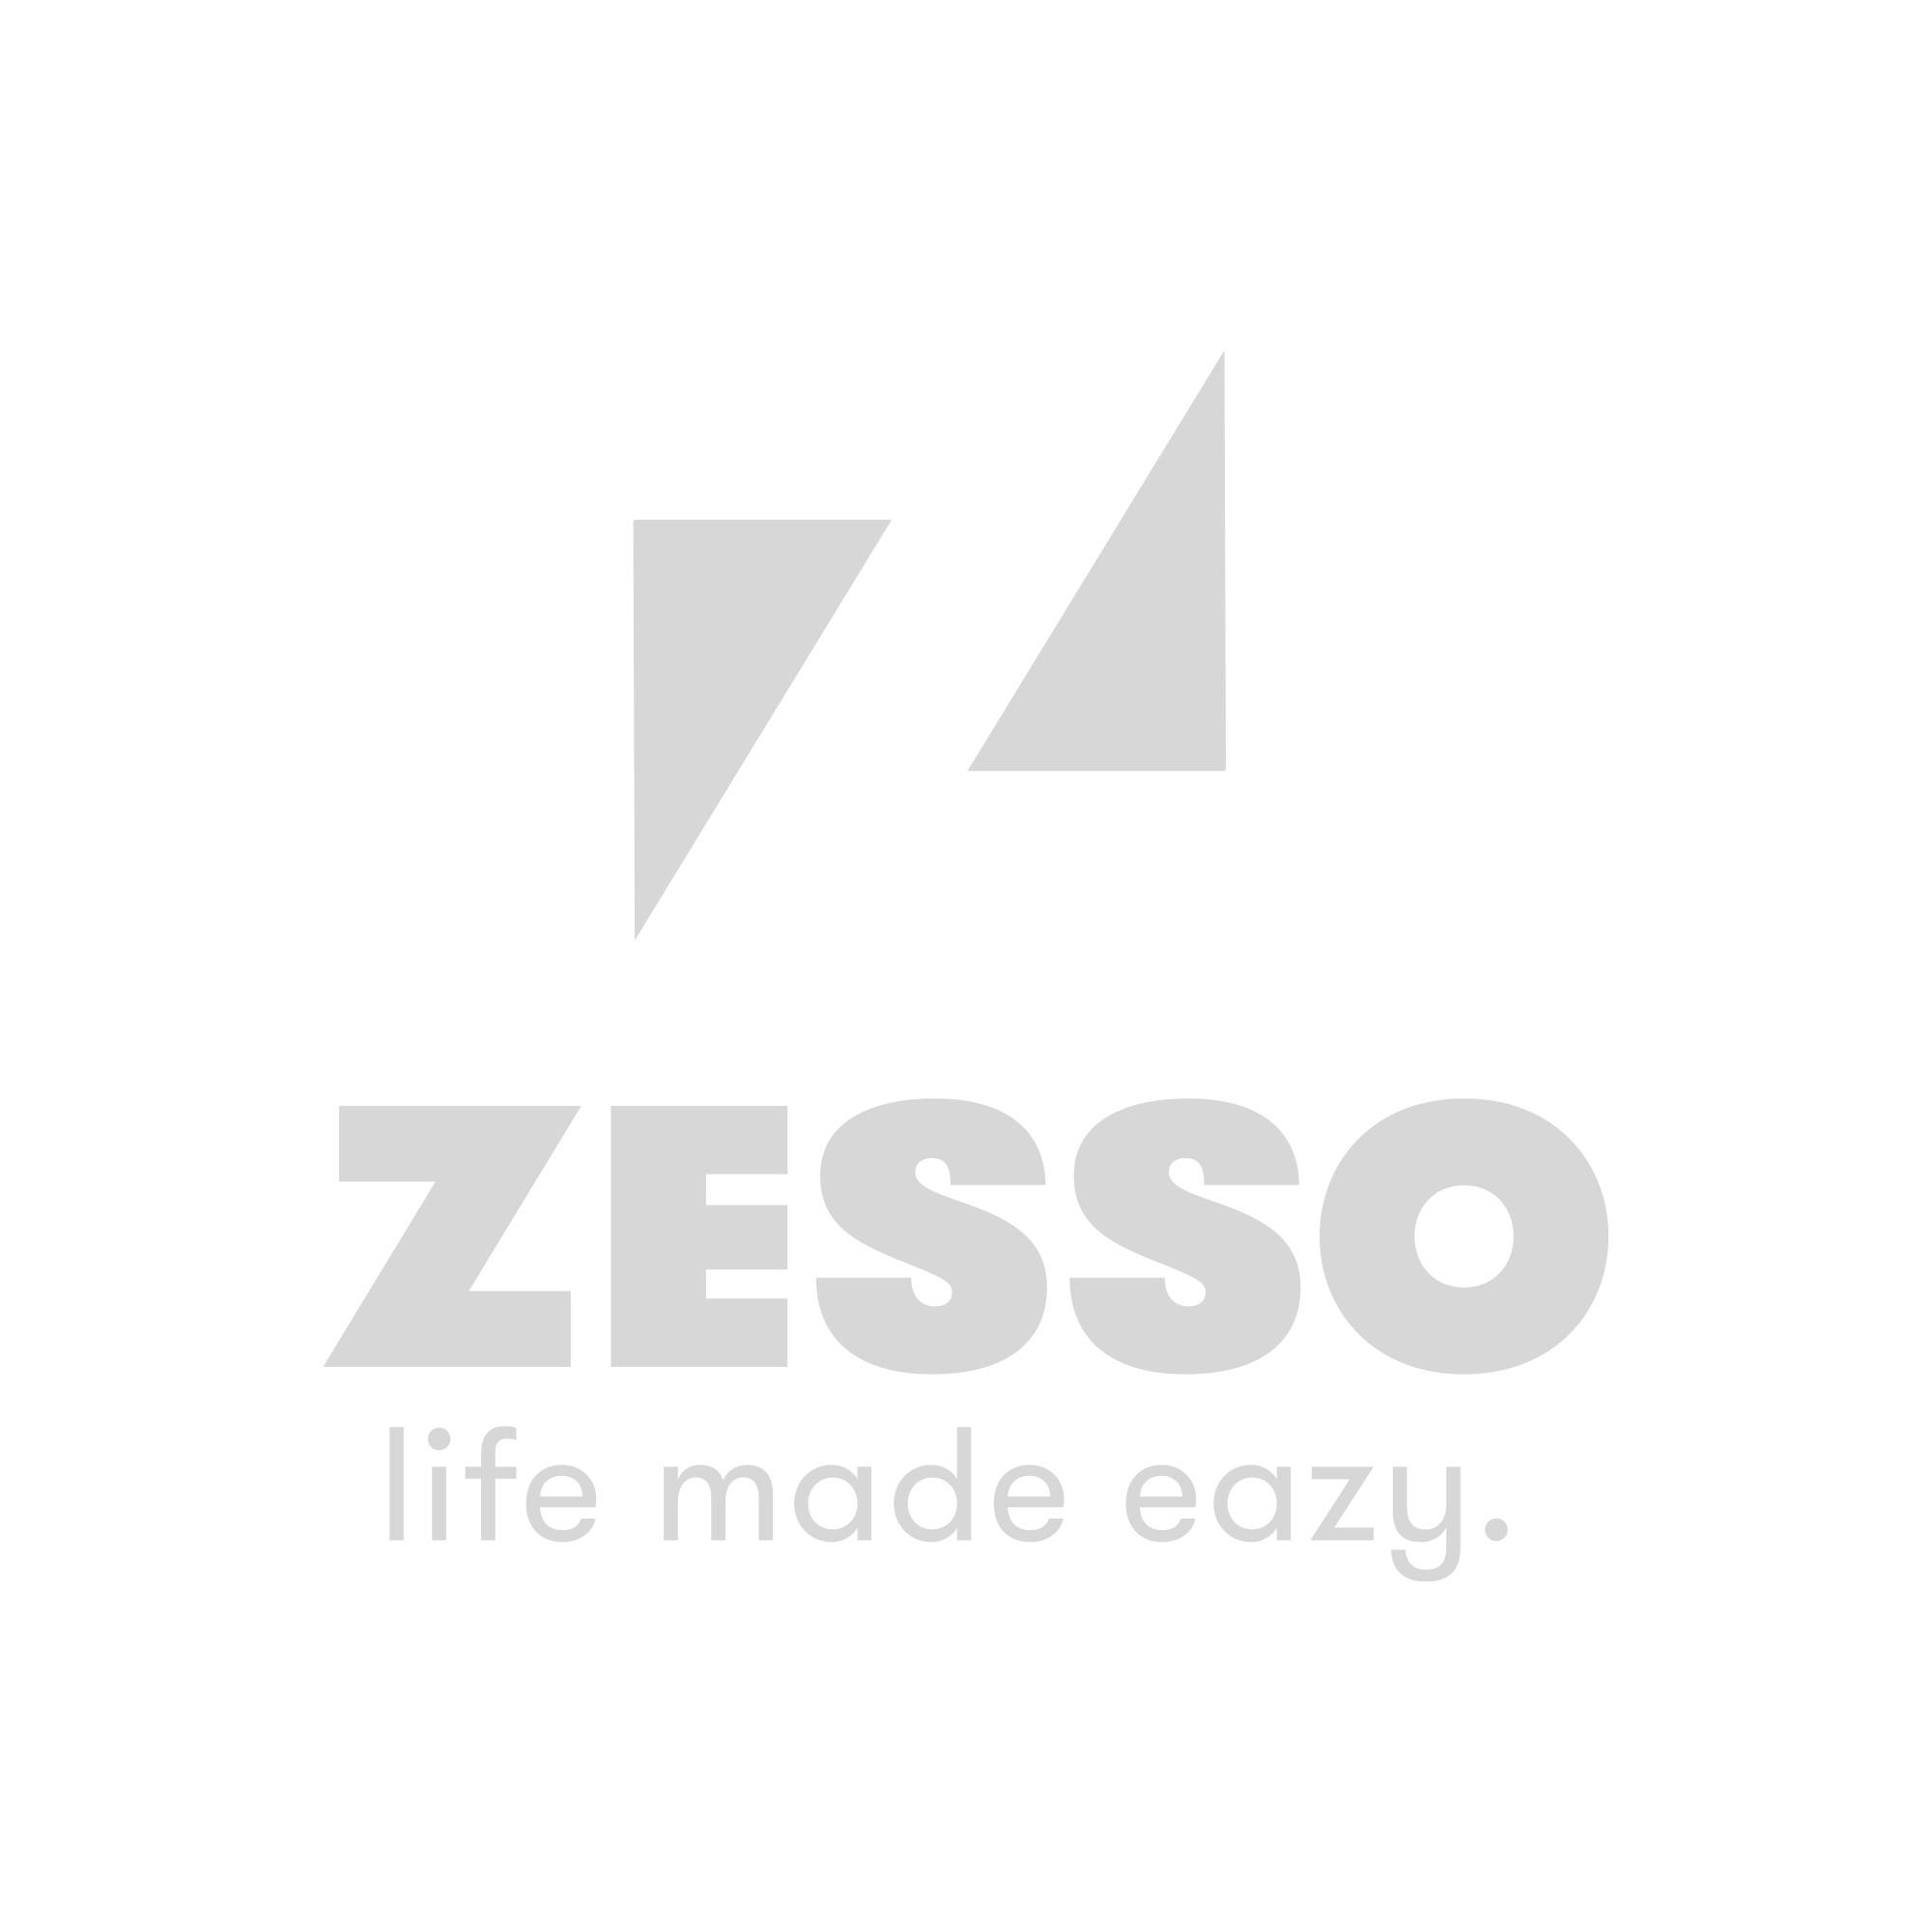 Trois Kilos Sept Babypyjama Set 6 Maanden Dots & White